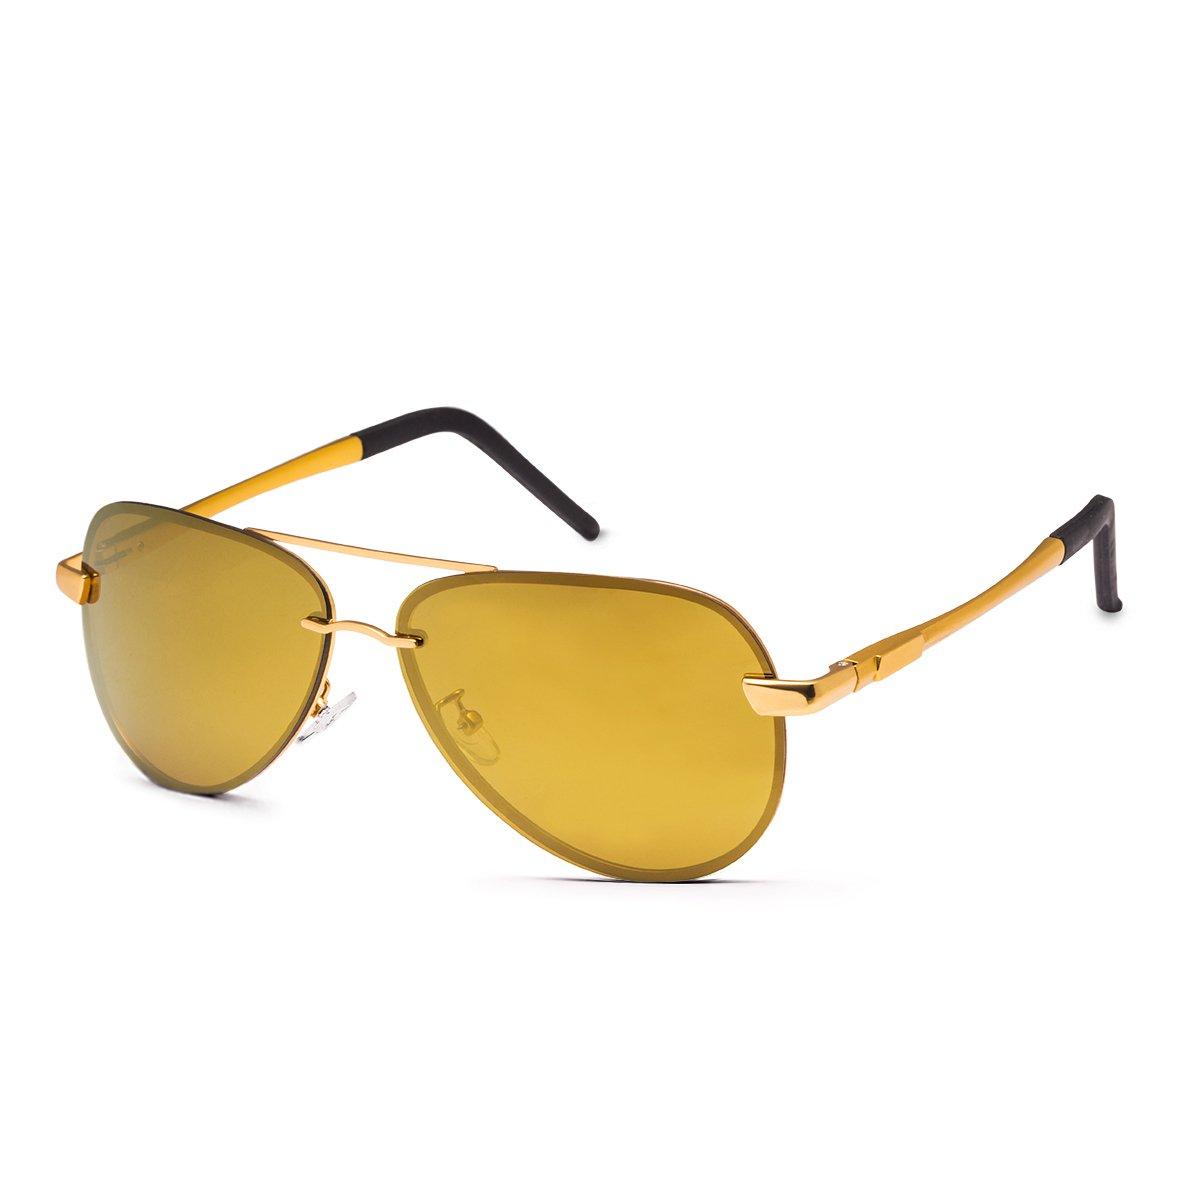 Aviator Sunglasses WISH CLUB polarized sunglasses Men\'s Retro Designer Shades UV400 Lens Outdoor Unisex Sun Glasses